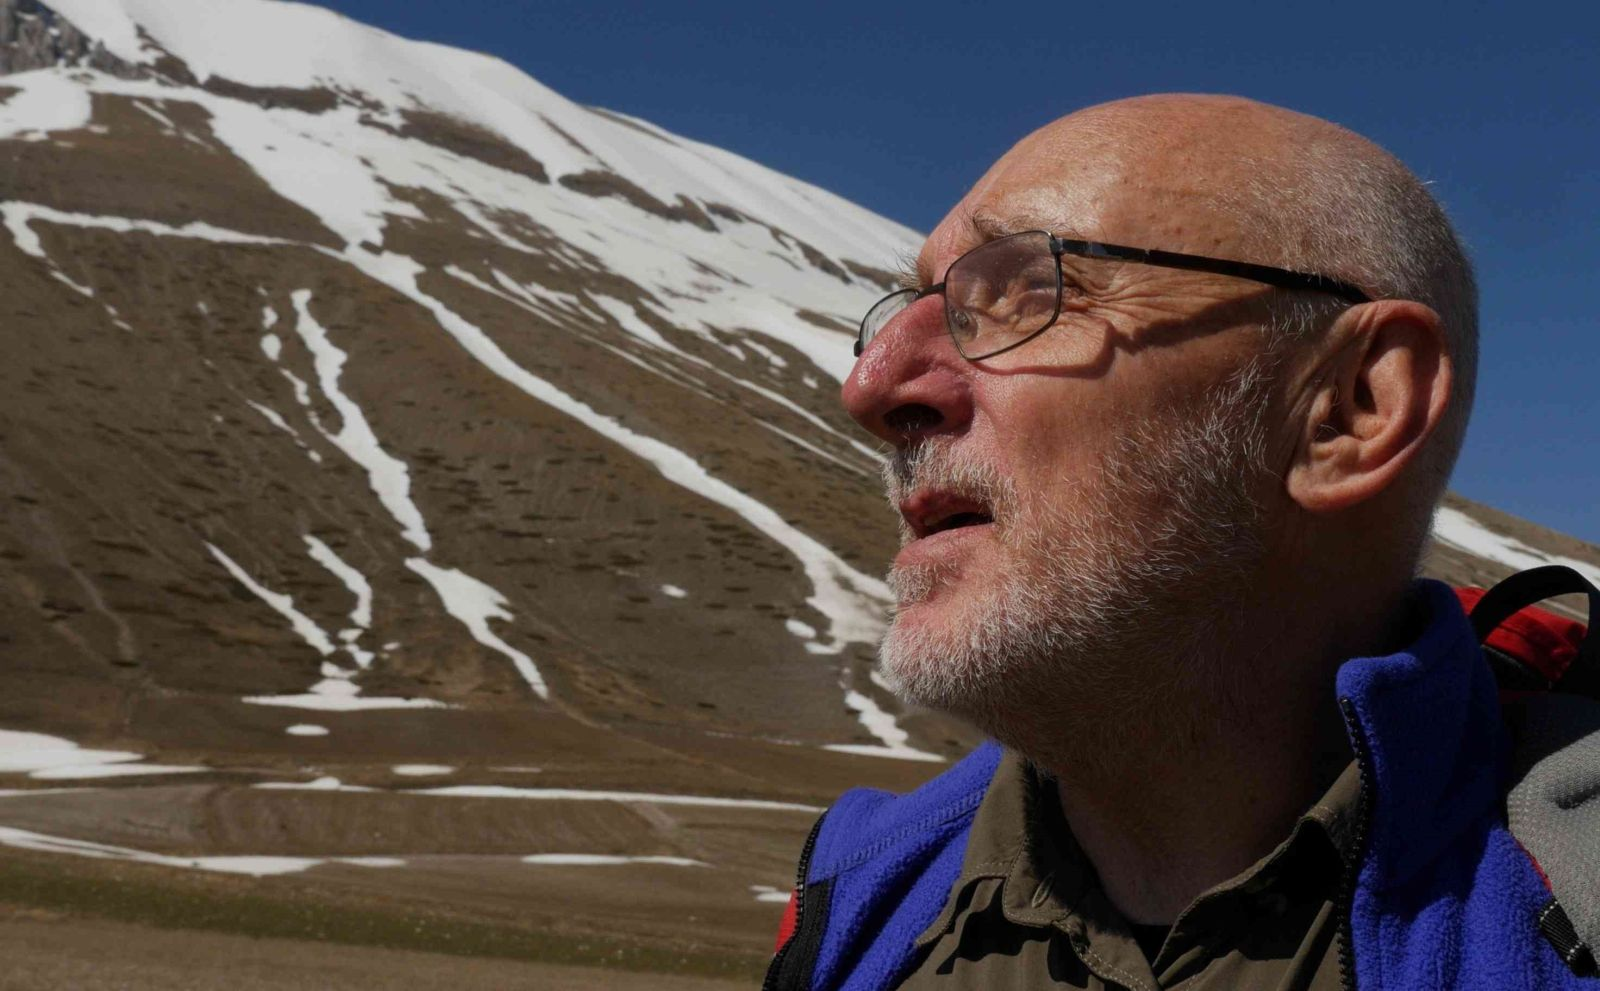 laeffe_I-viaggi-di-Paolo-Rumiz_La-leggenda-dei-monti-naviganti